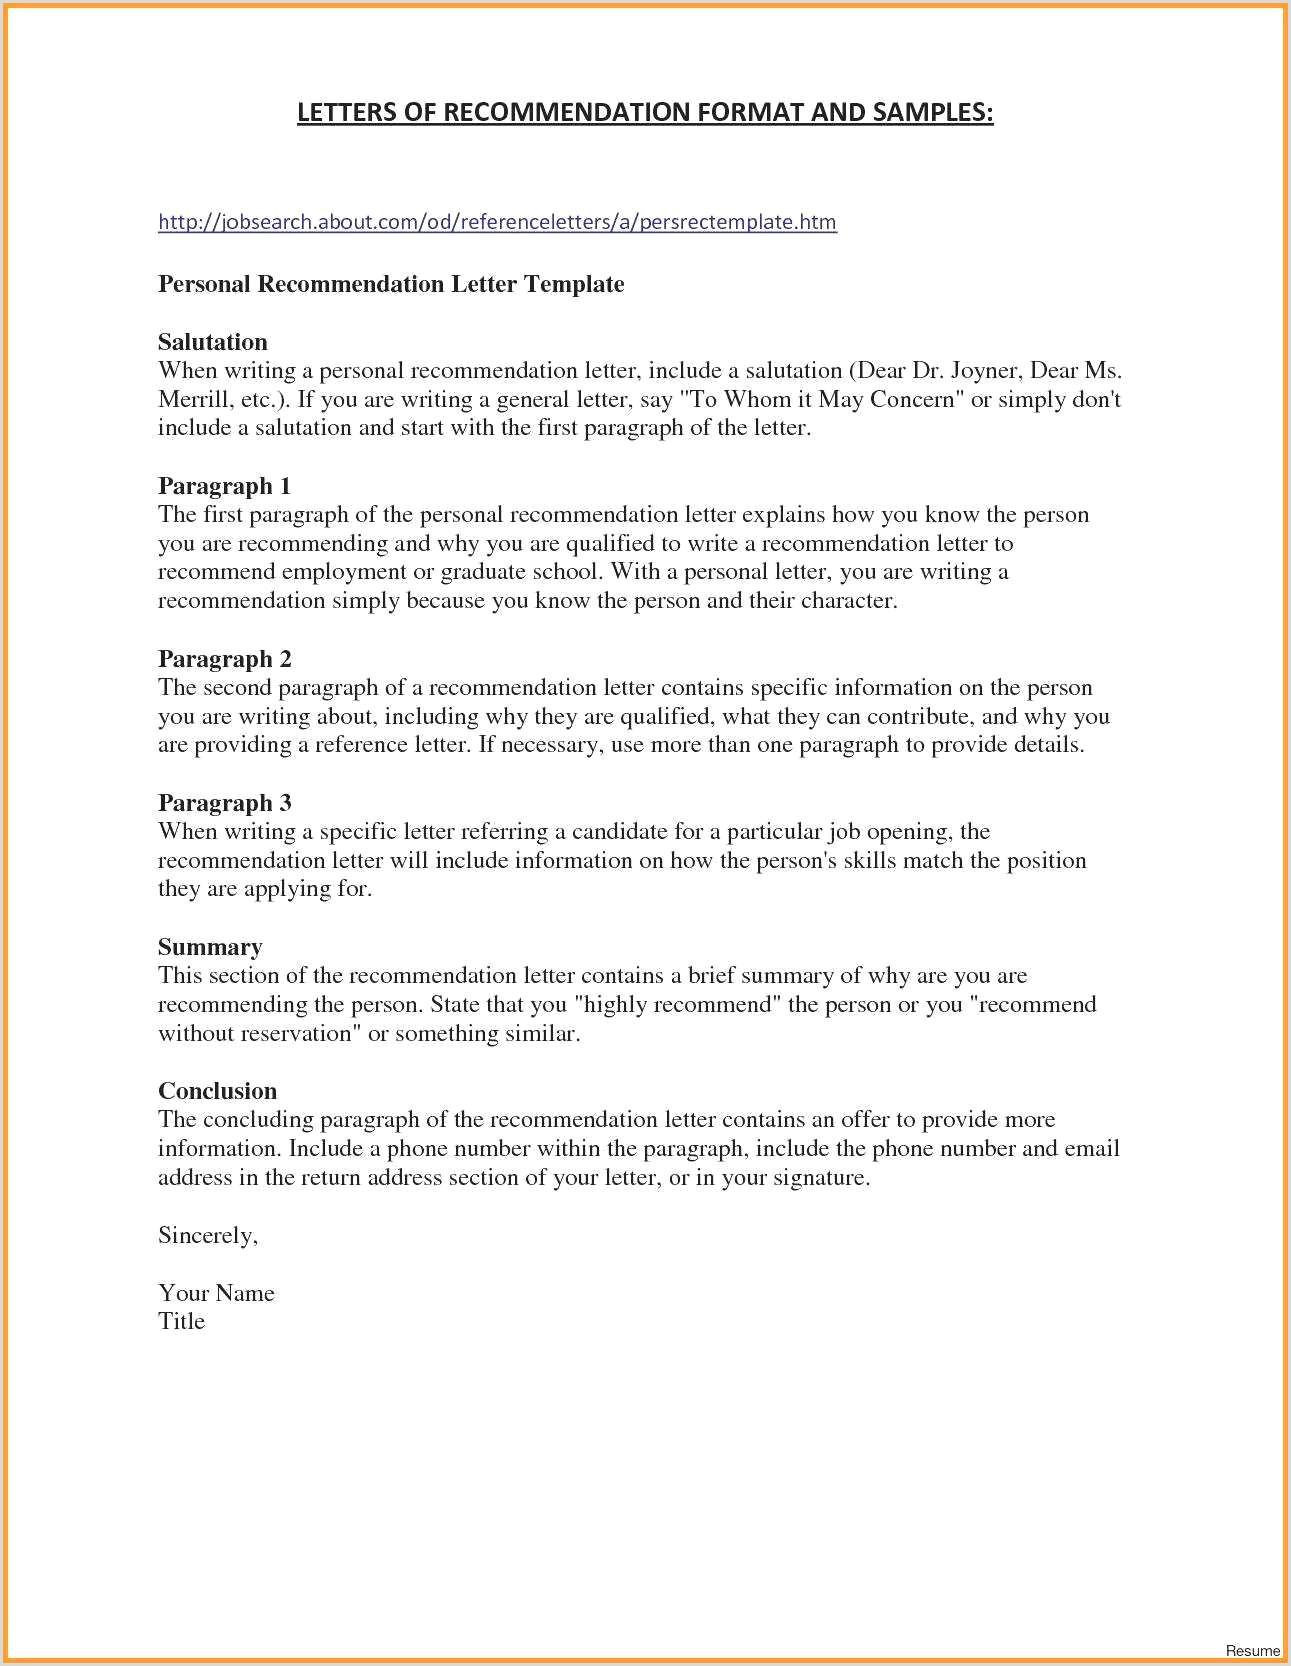 Resume Personal Statement New Typing Fresh Beautiful